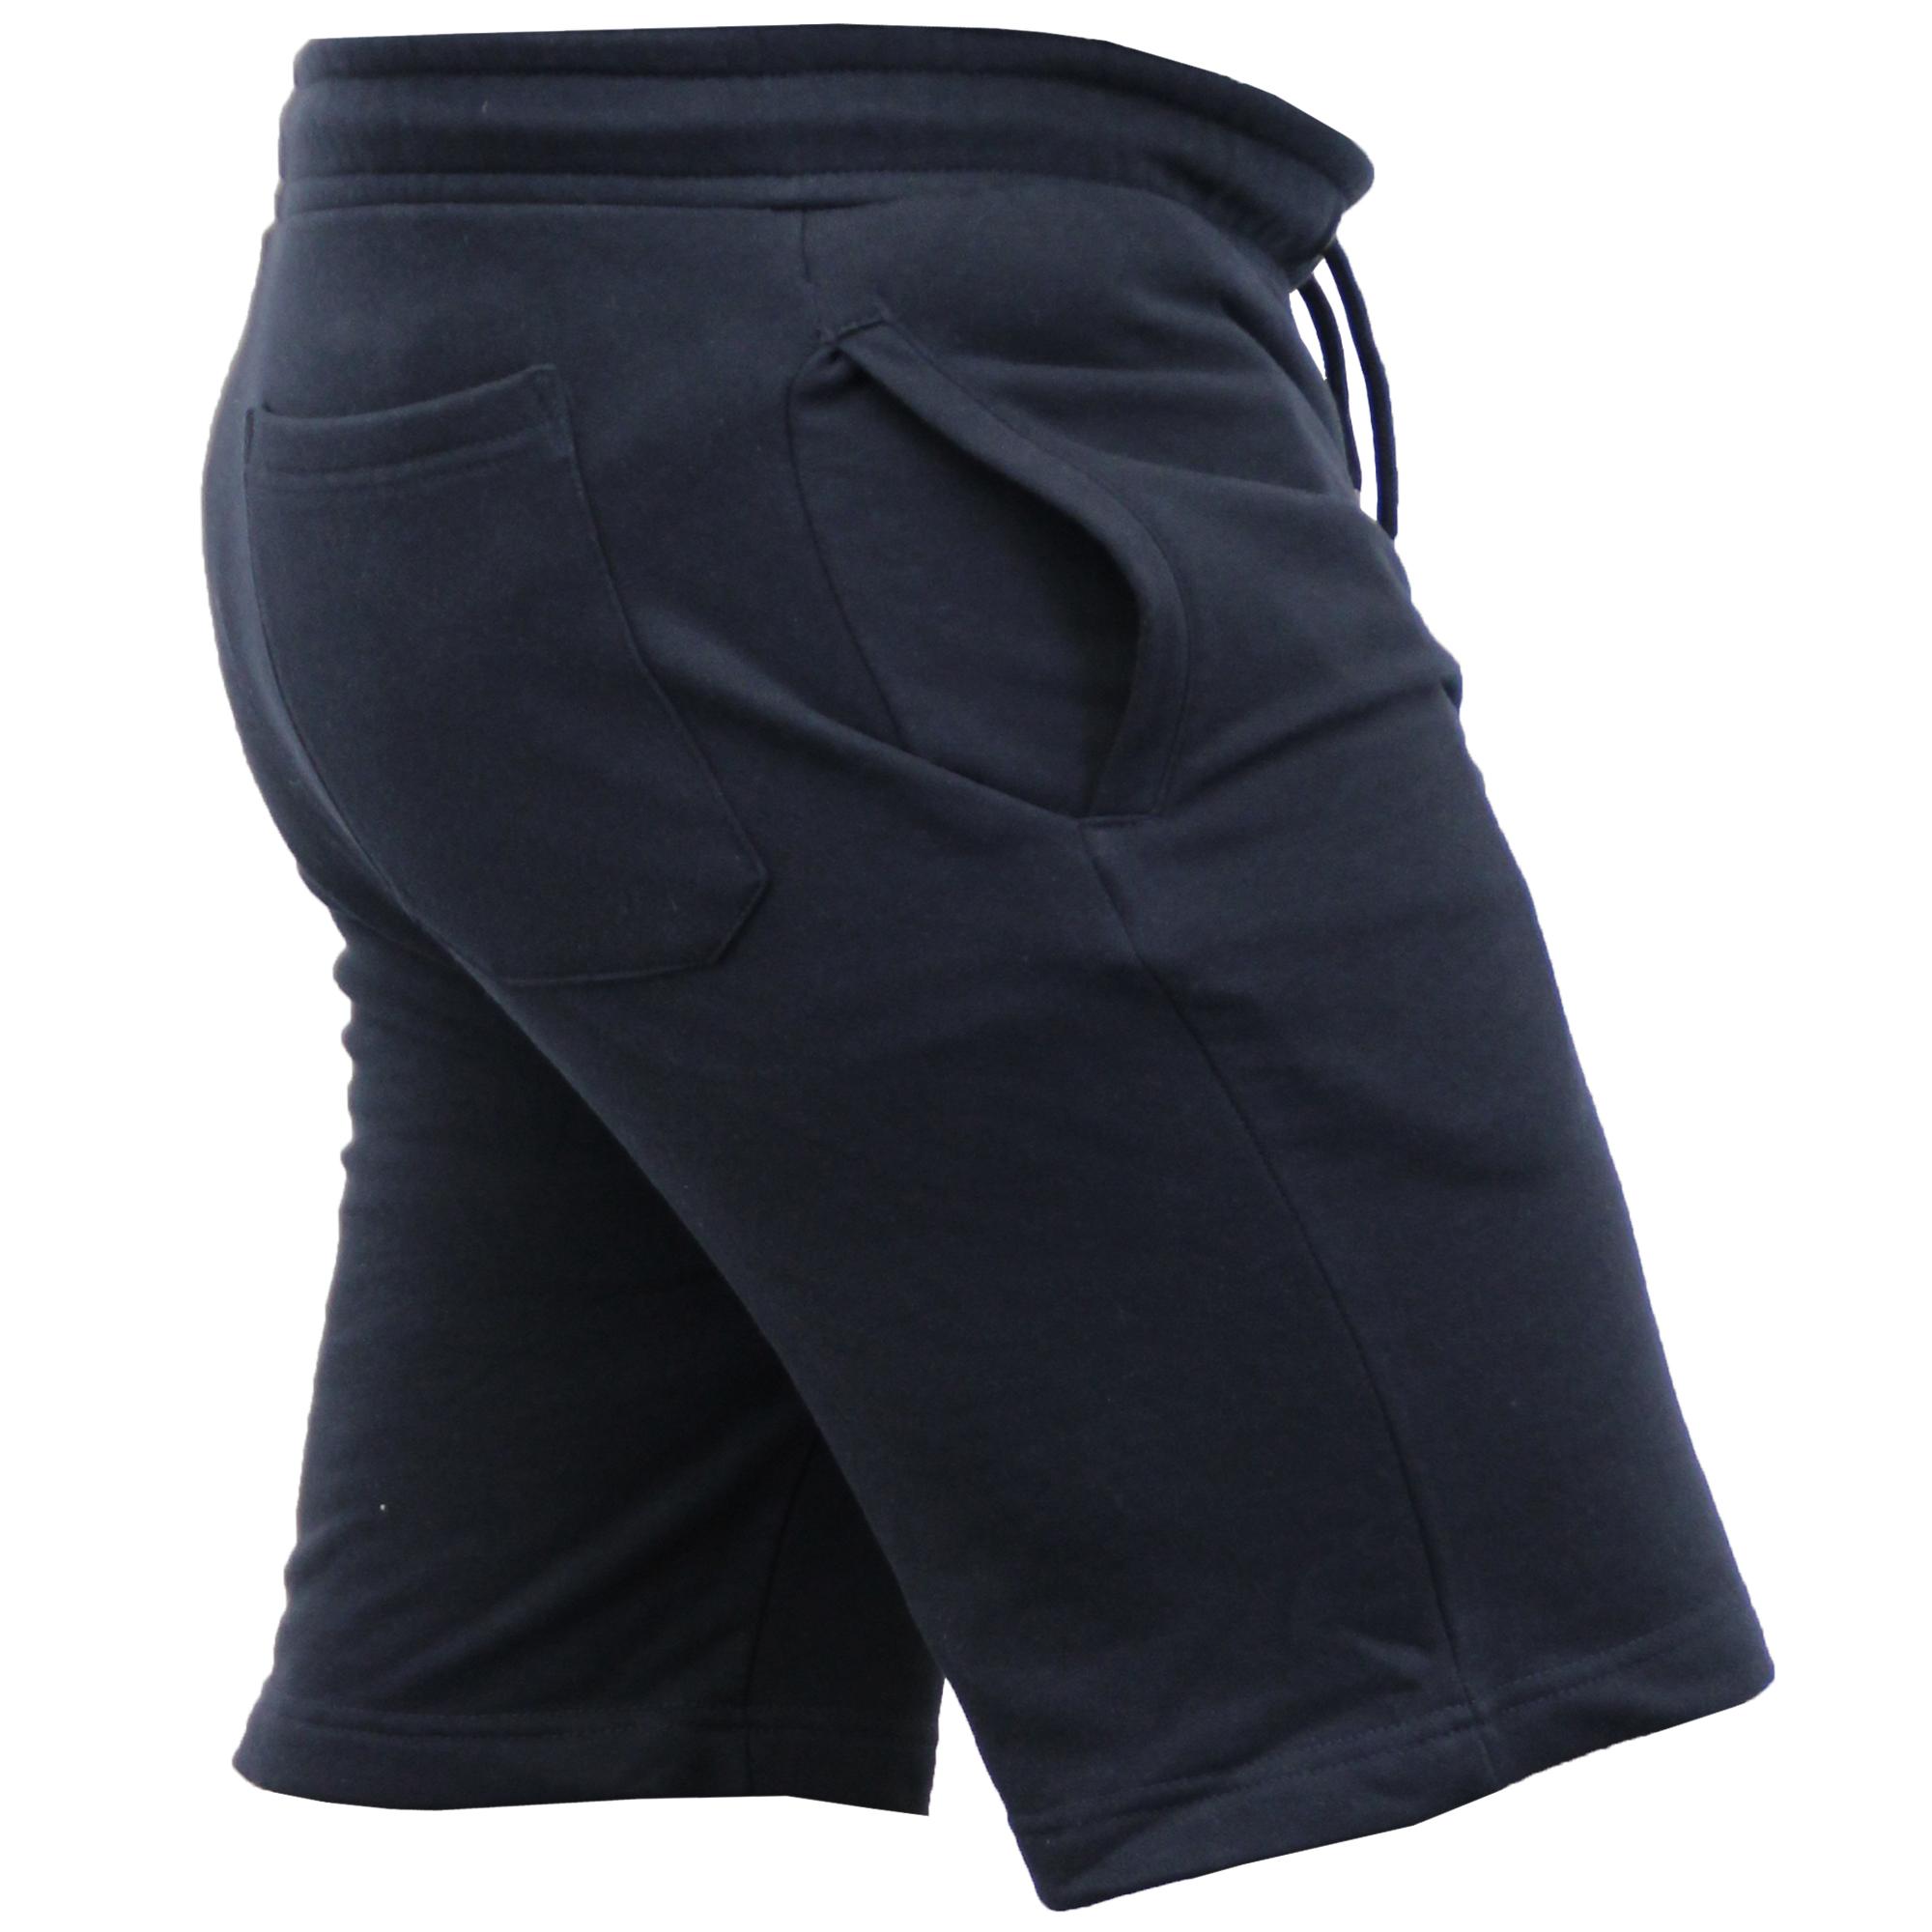 Mens-Jogger-Shorts-Tarley-by-Brave-Soul-Knee-Length-Casual-Fleece-Lined-Summer thumbnail 26